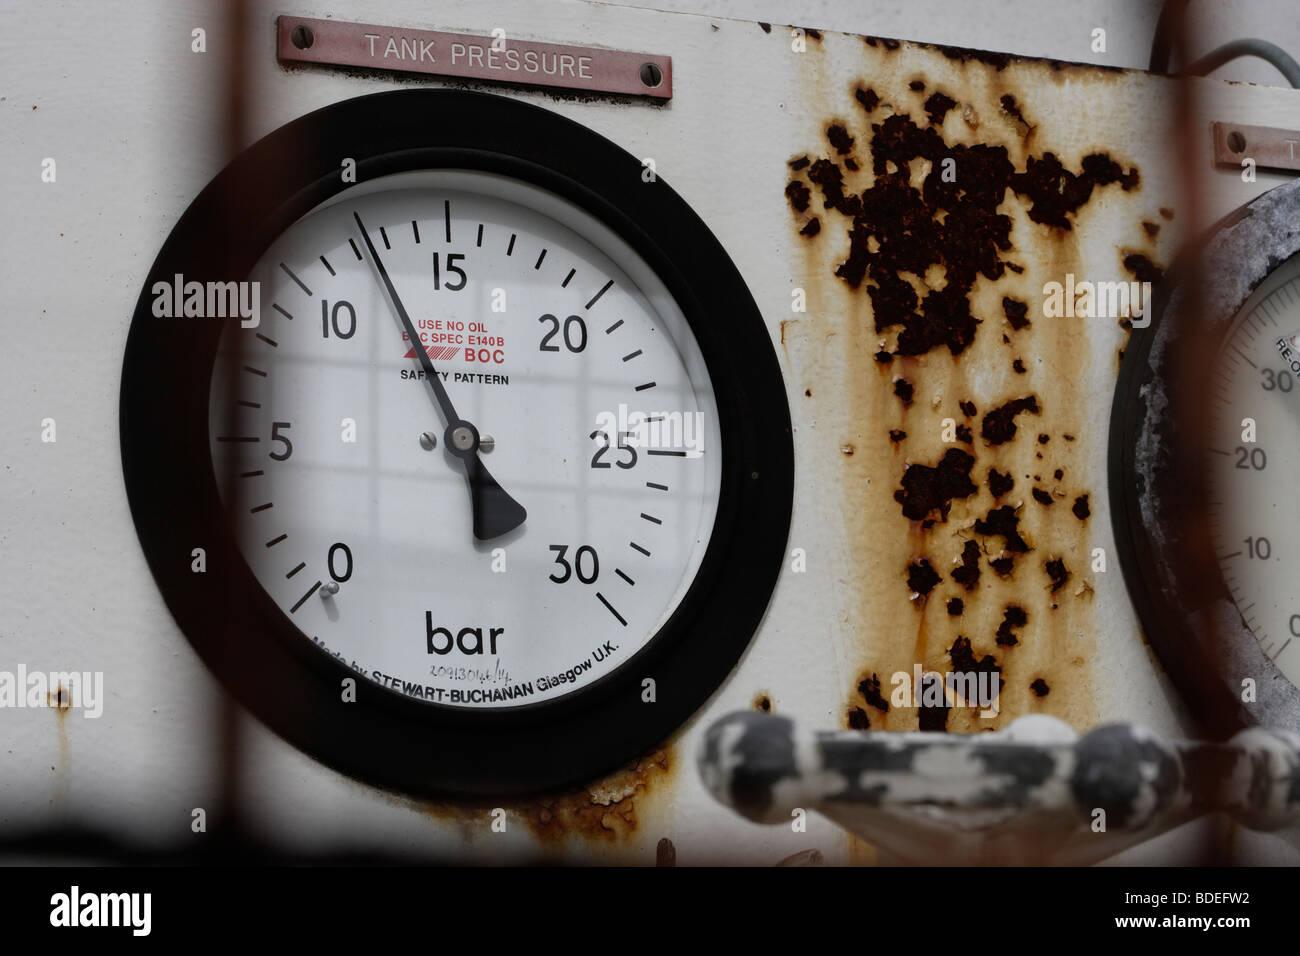 tank pressure gauge - Stock Image